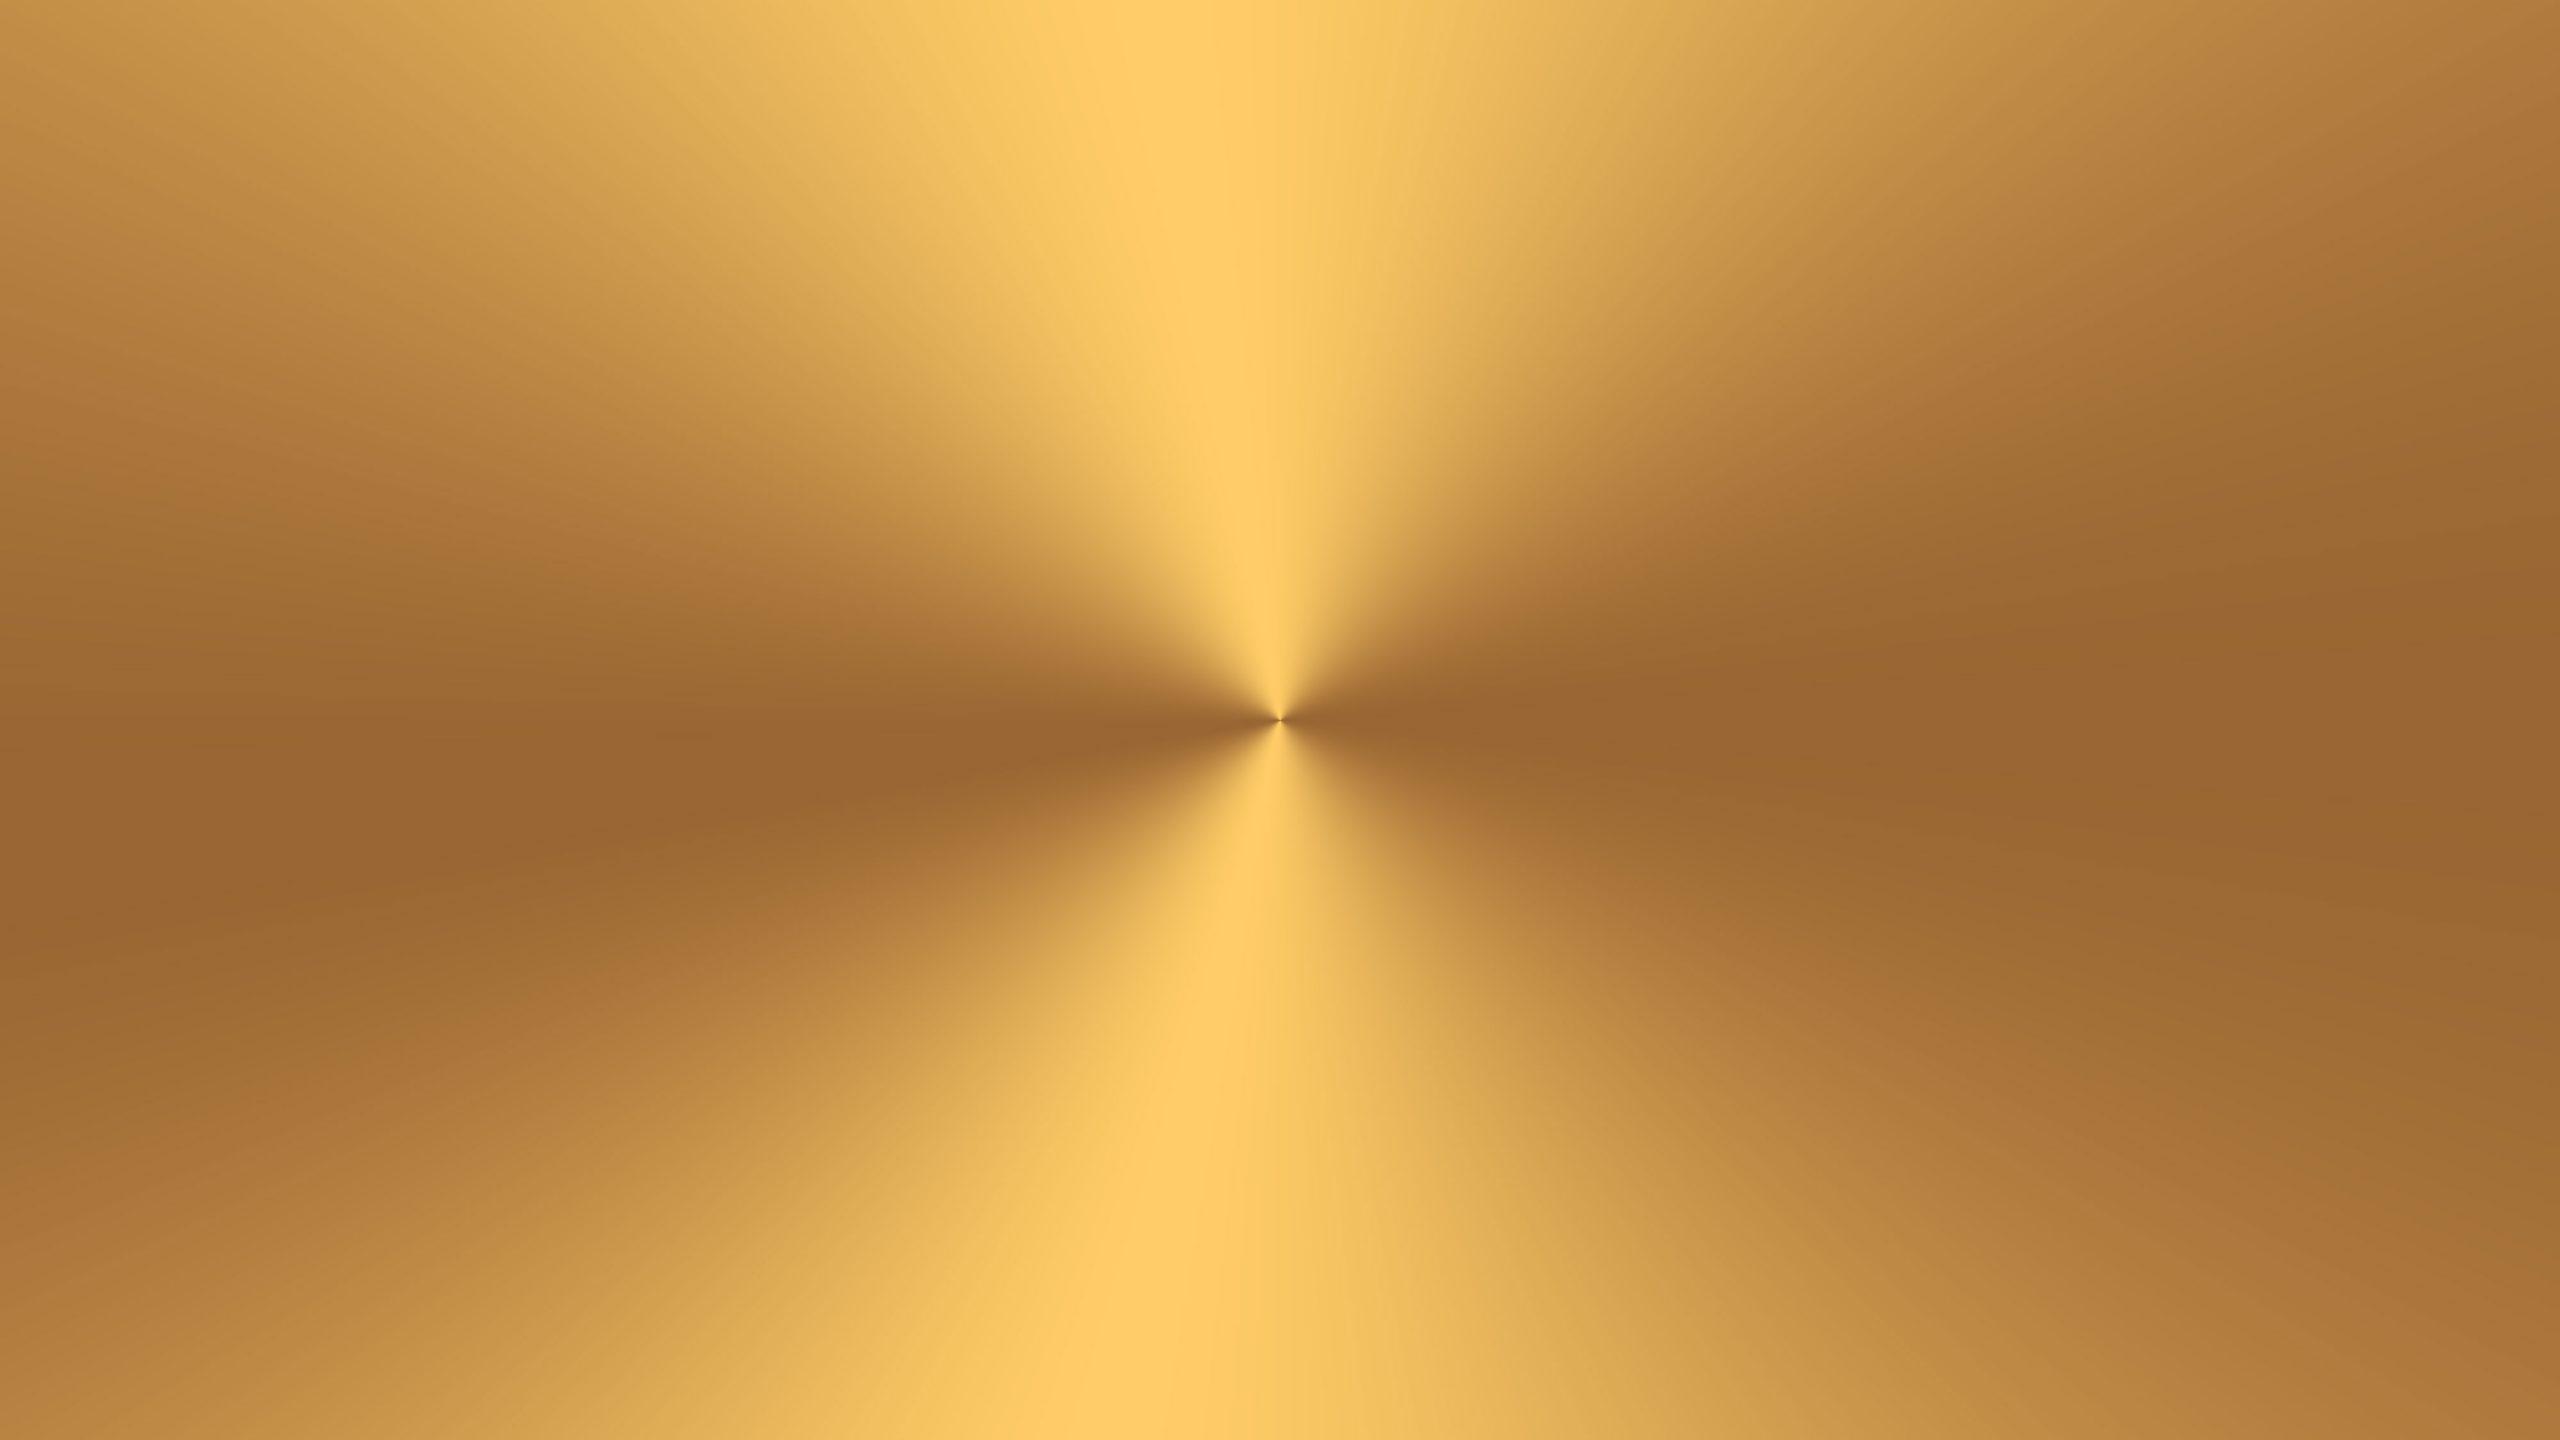 Golden texture background